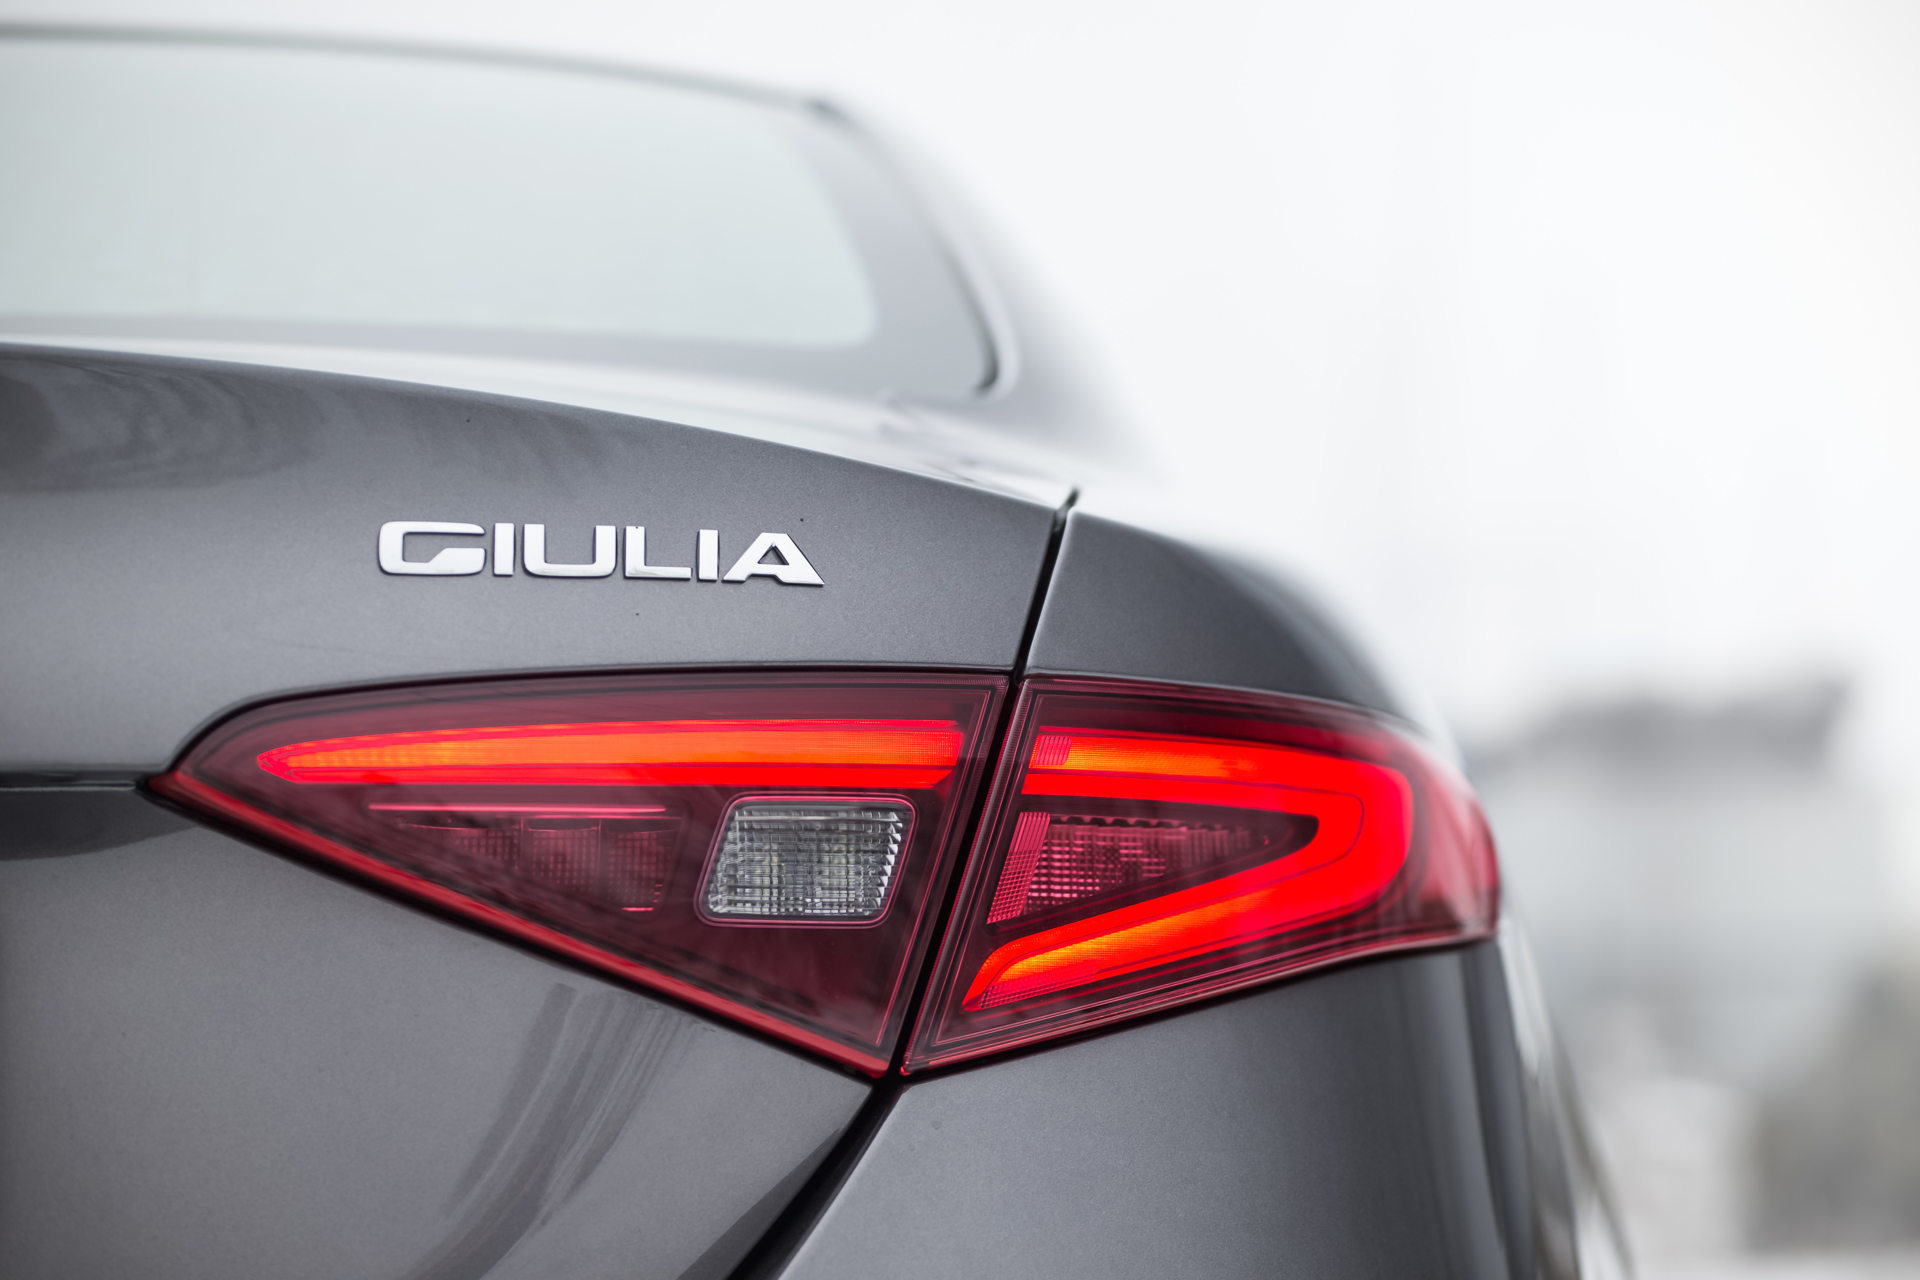 1_Giulia-Benzina-5.jpg